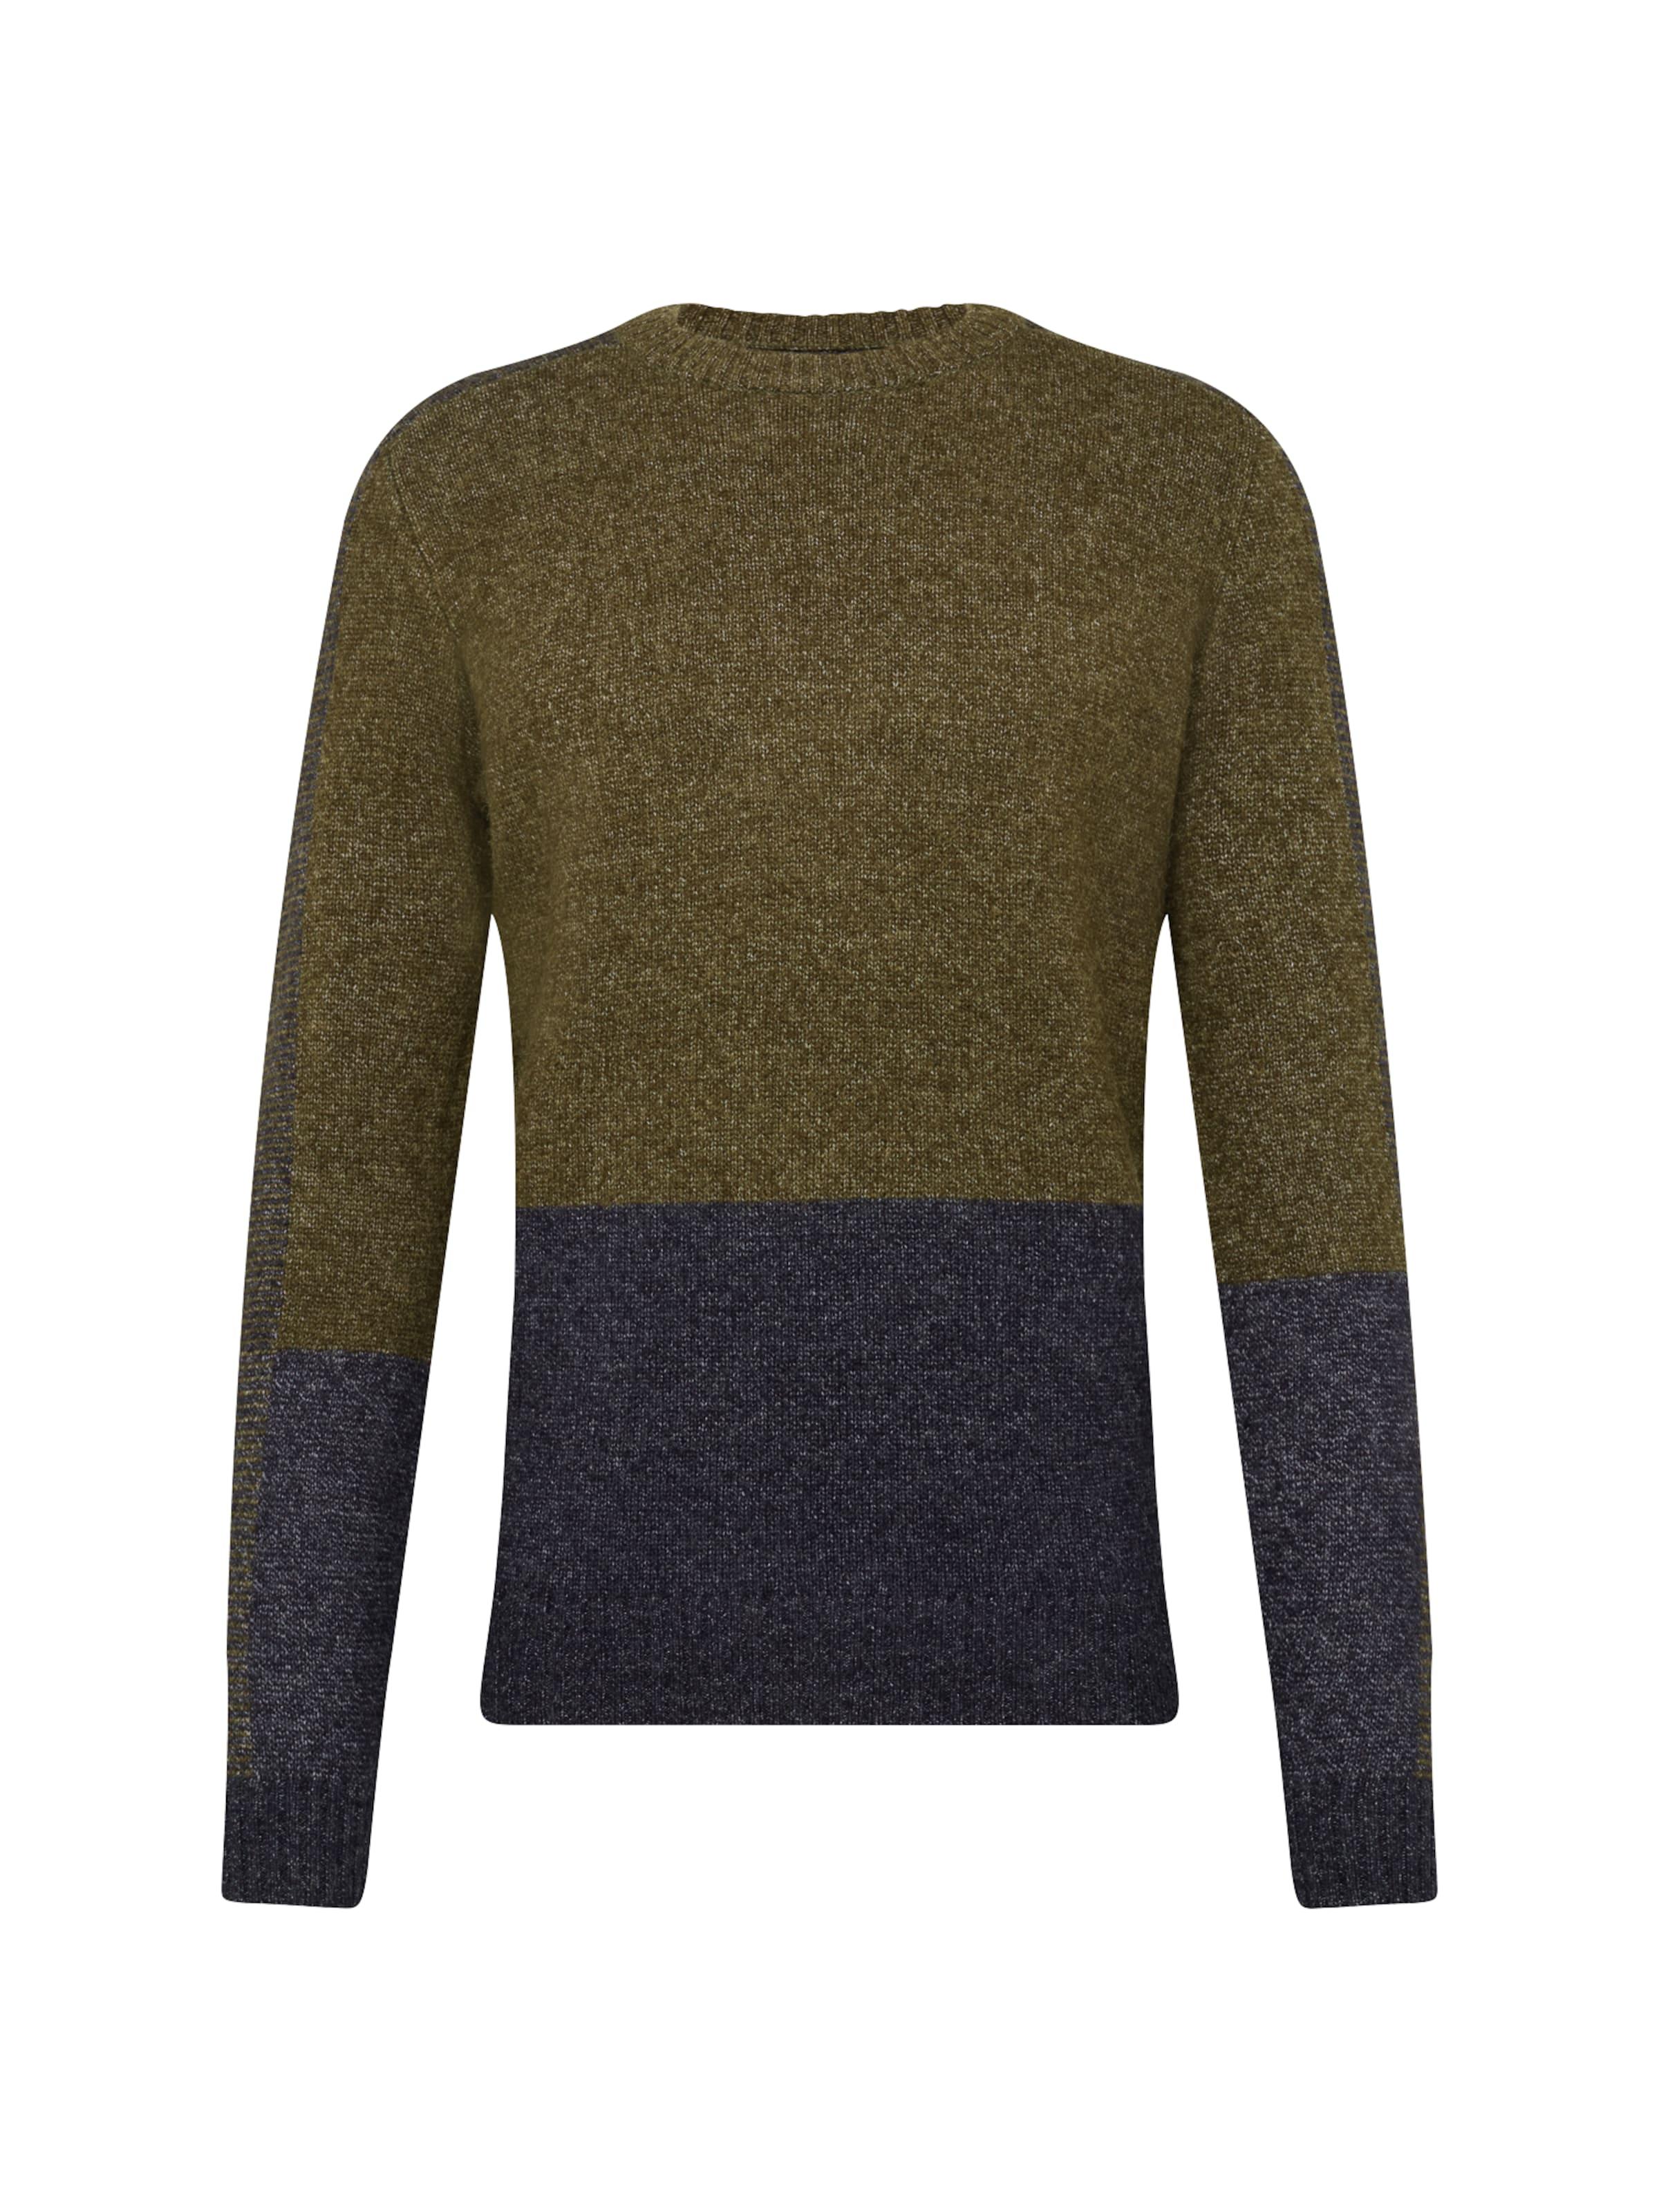 Sweatshirt Sweatshirt Tom Tom In Tailor Tailor MarineOliv WHID29E